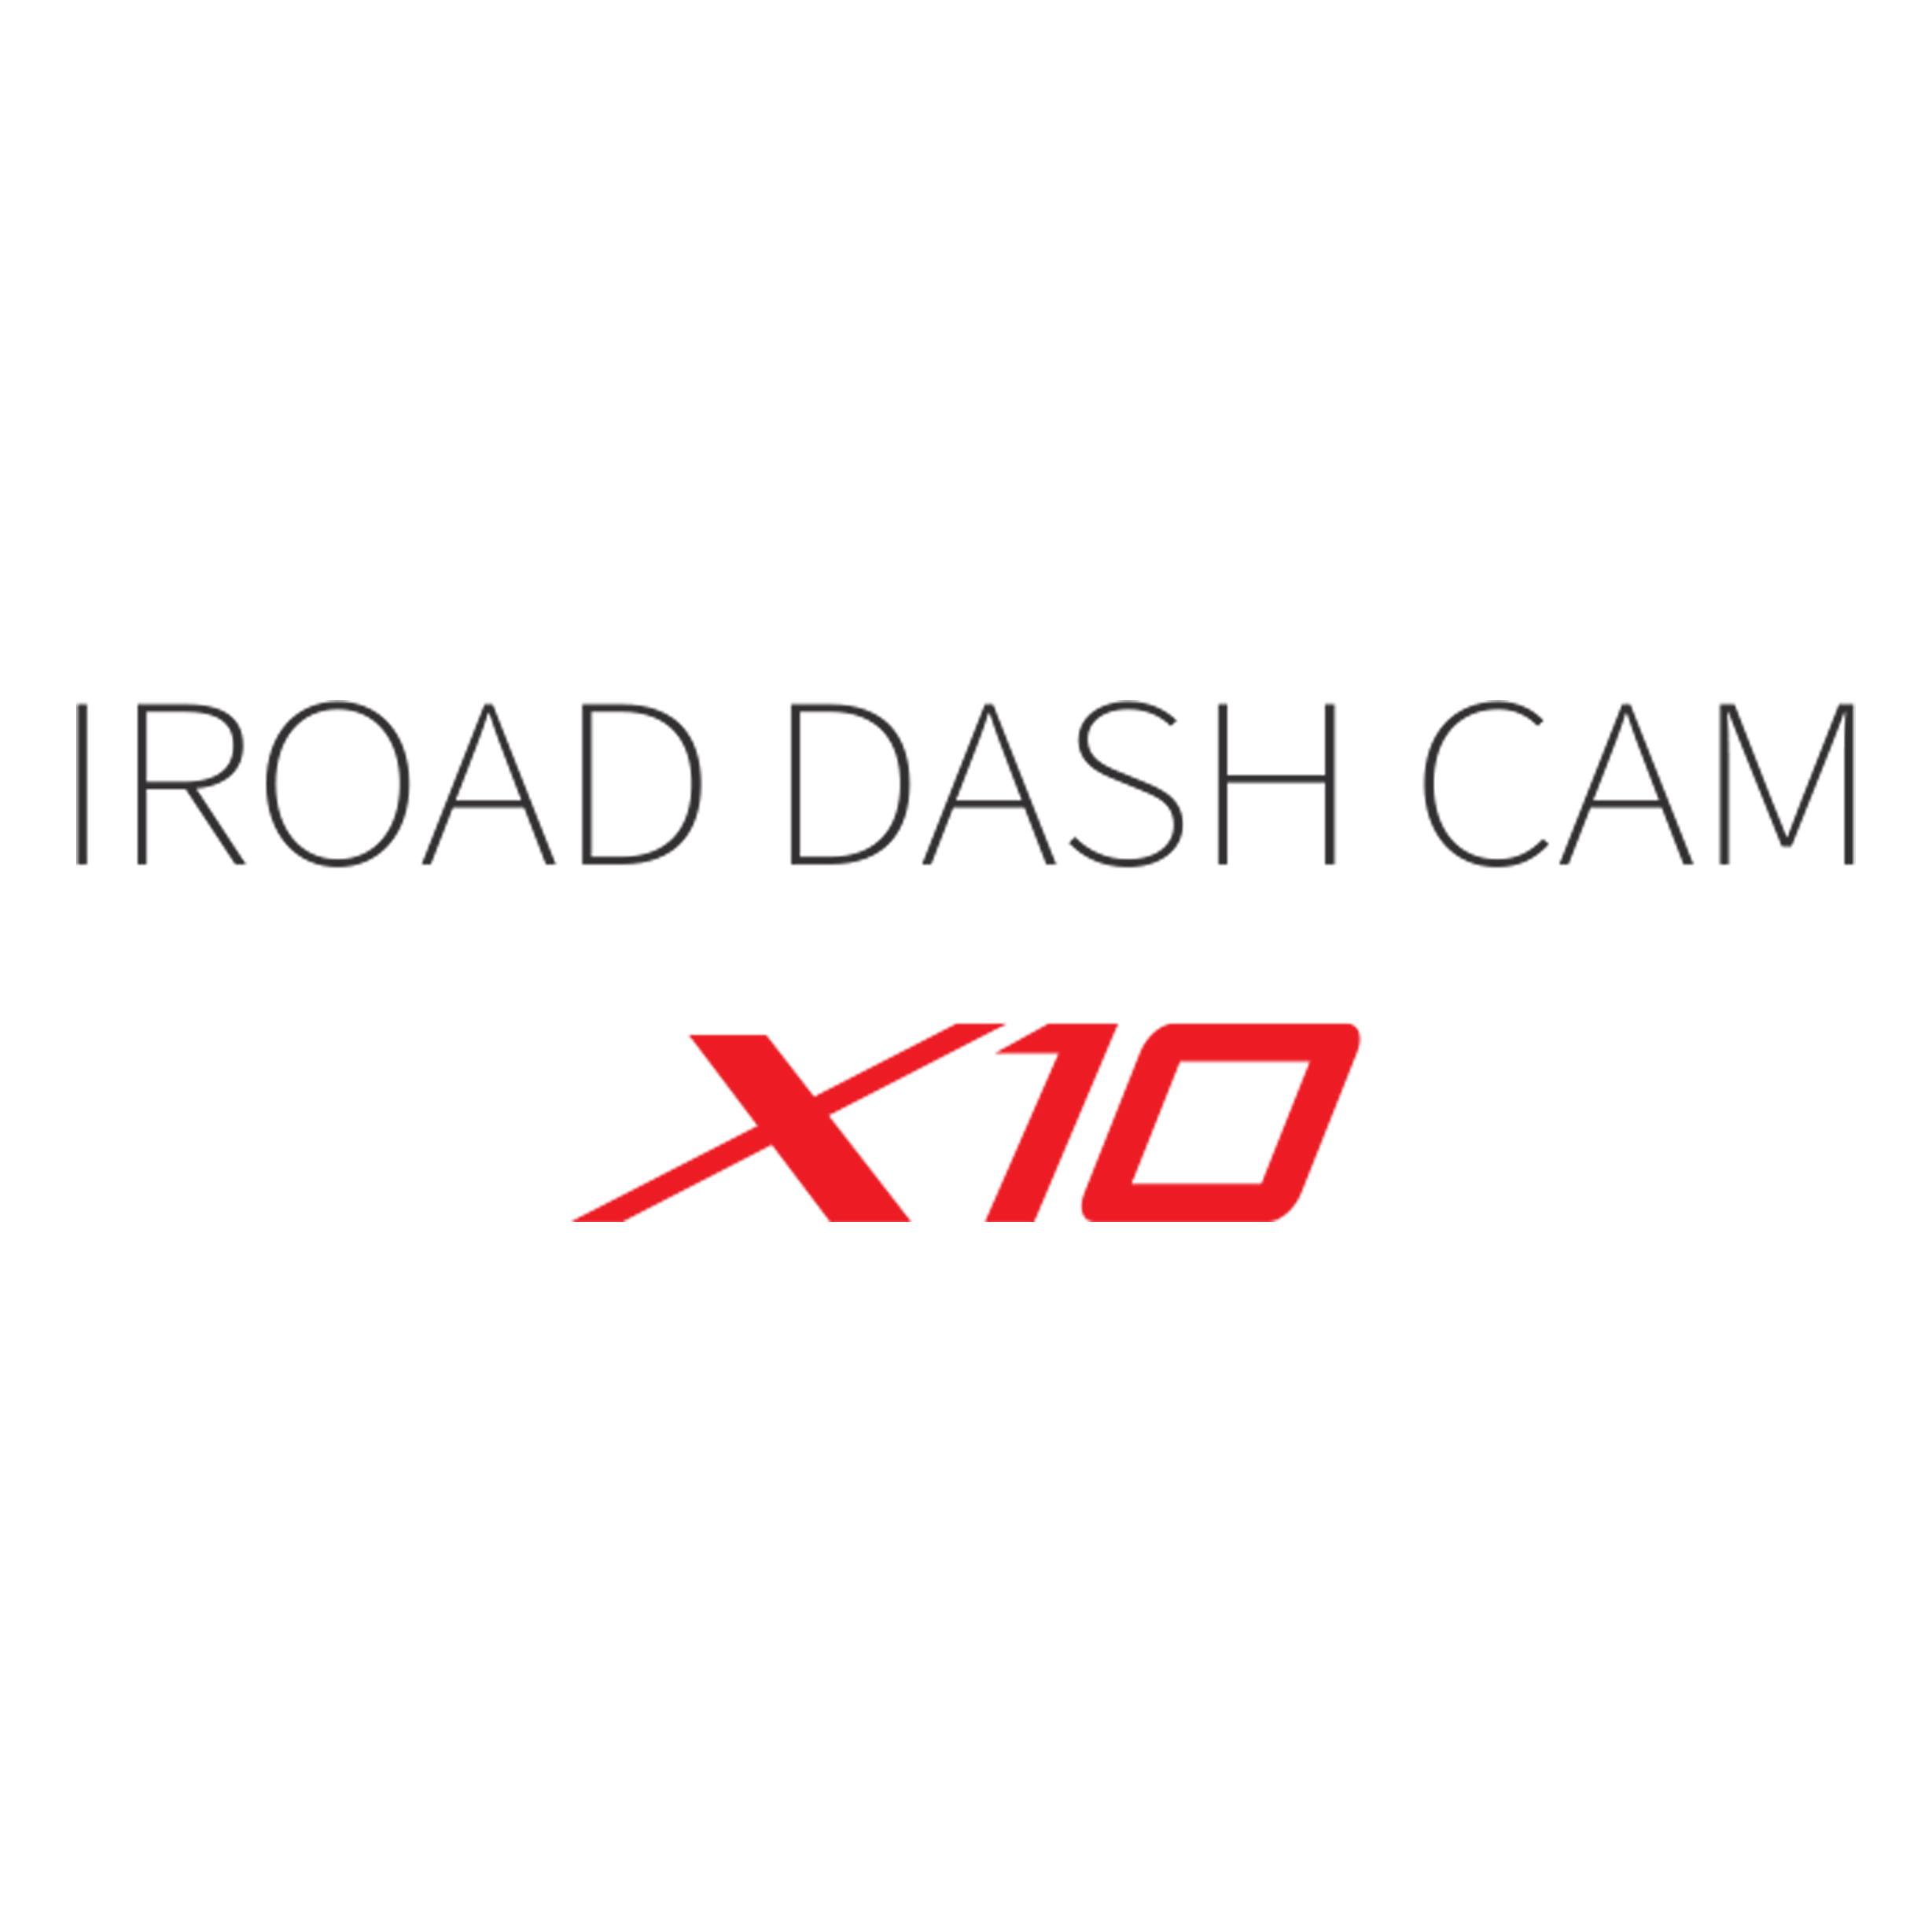 دوربین خودرو IROAD X10 4K-دوربین خودرو هوشمند شرکت یکتانگر